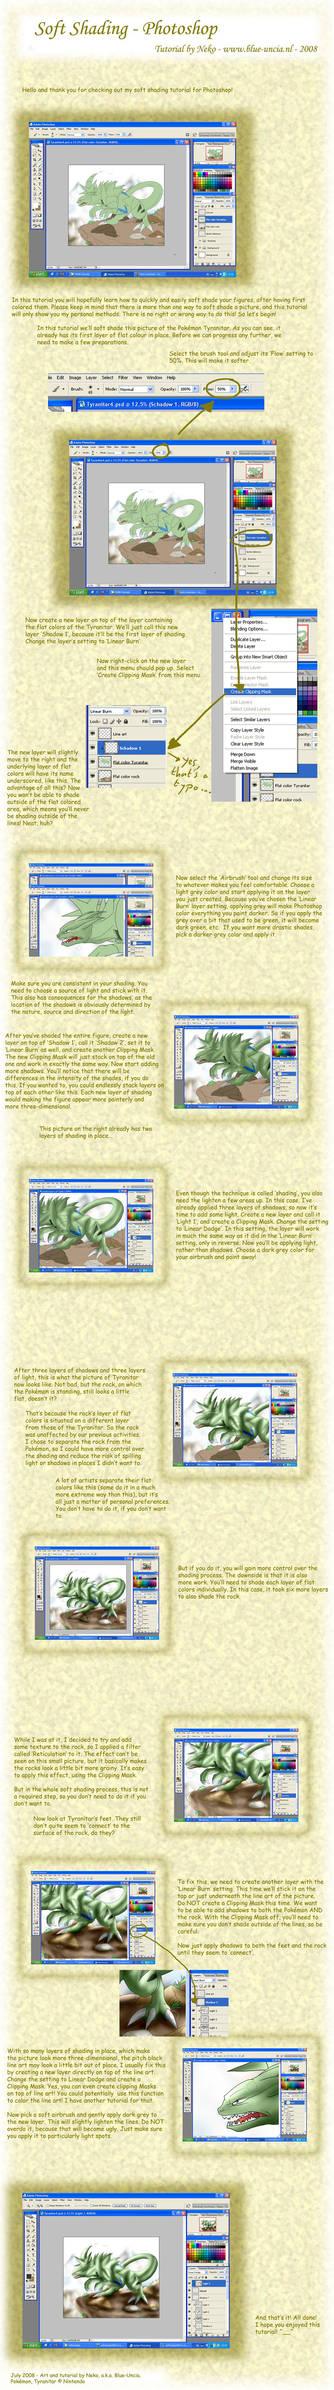 Soft shading tutorial